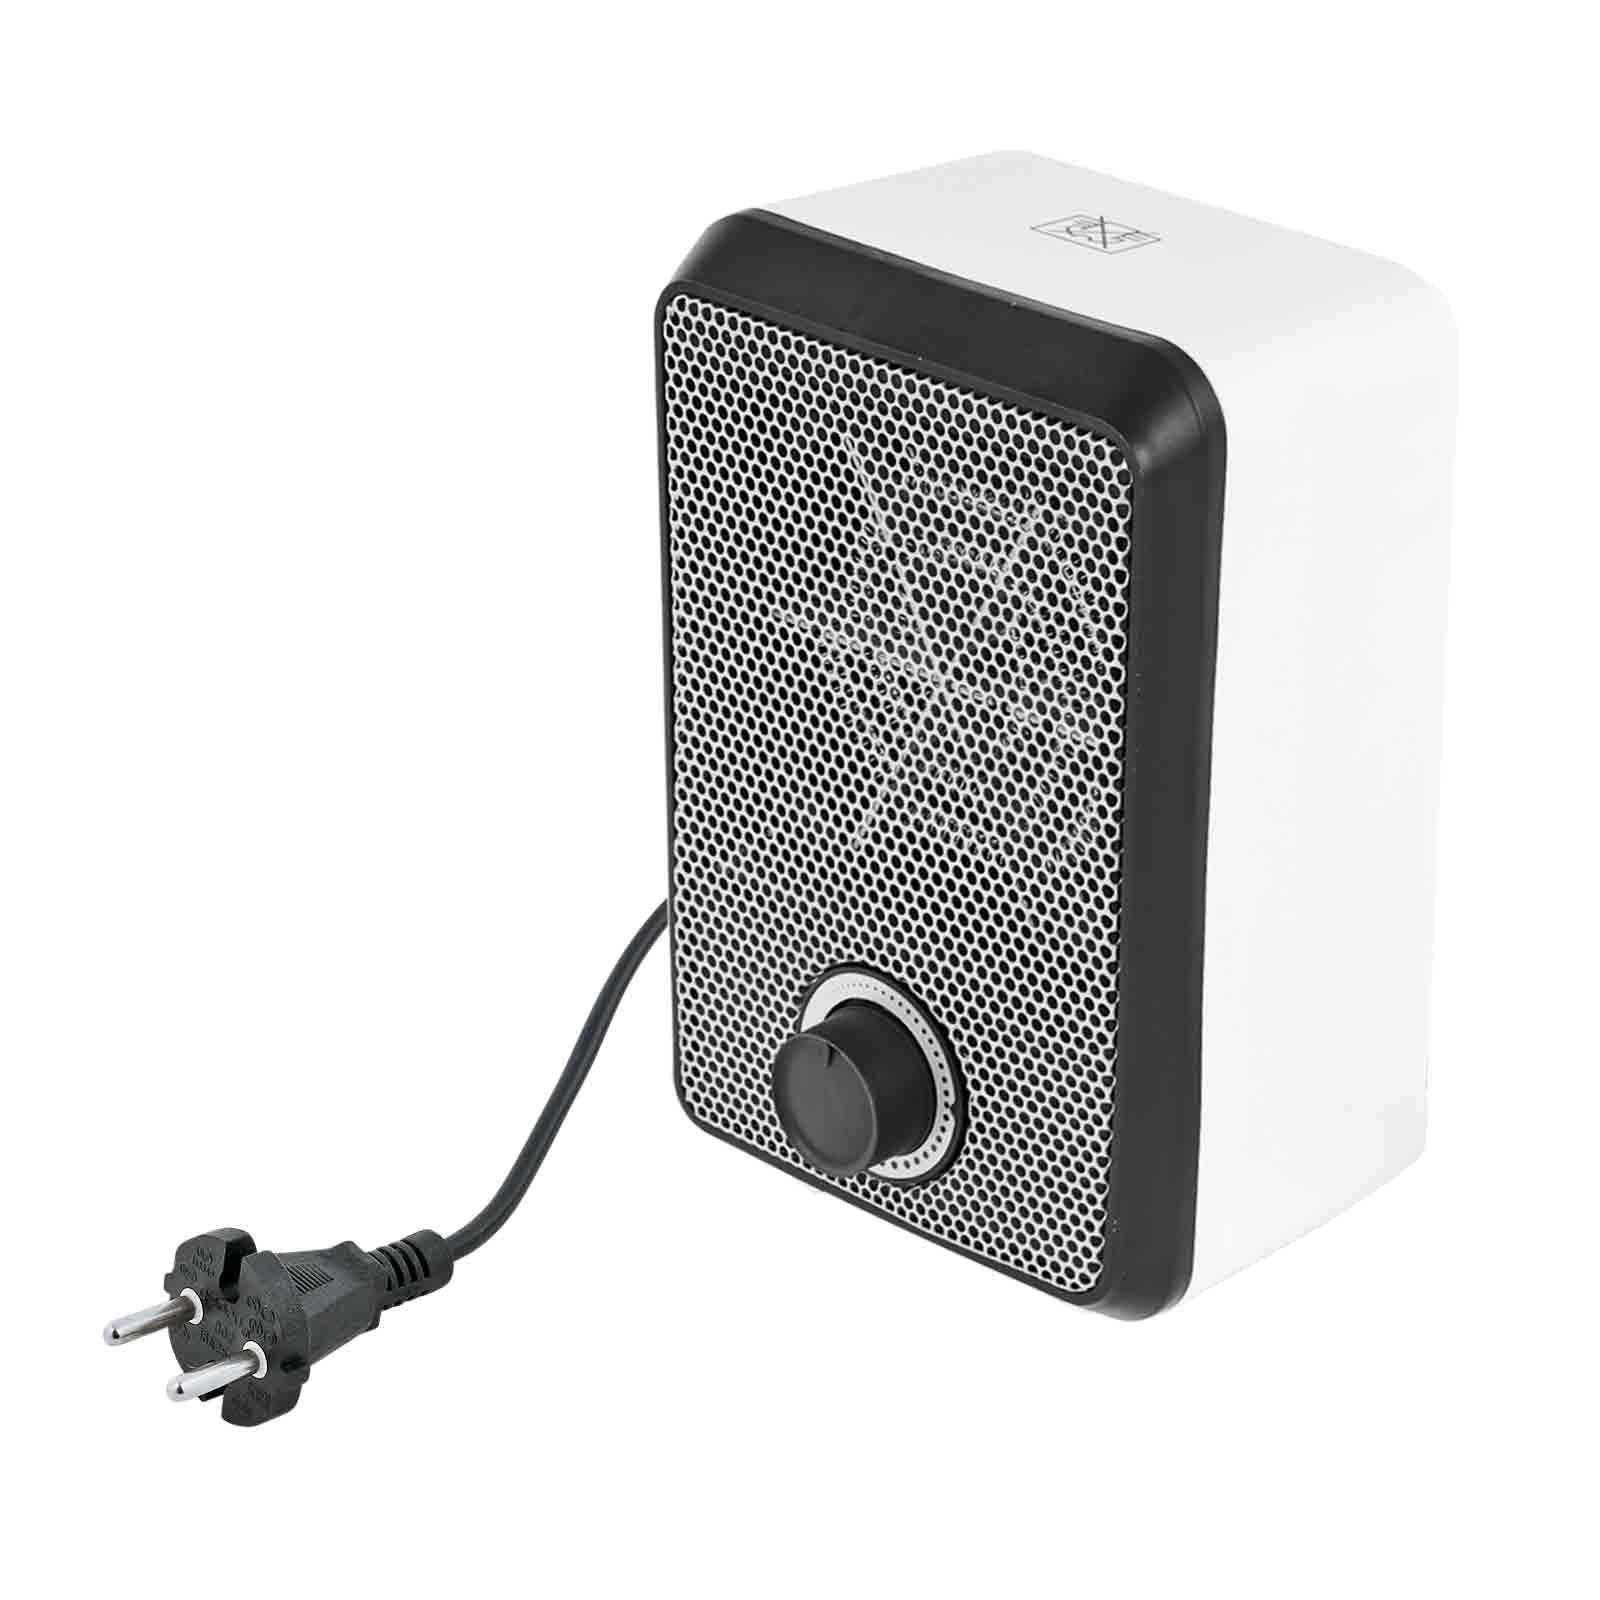 Mini Heizlüfter Sunny Warm 600 Watt 19 x 12 x 10 cm ideal für Wintercamping